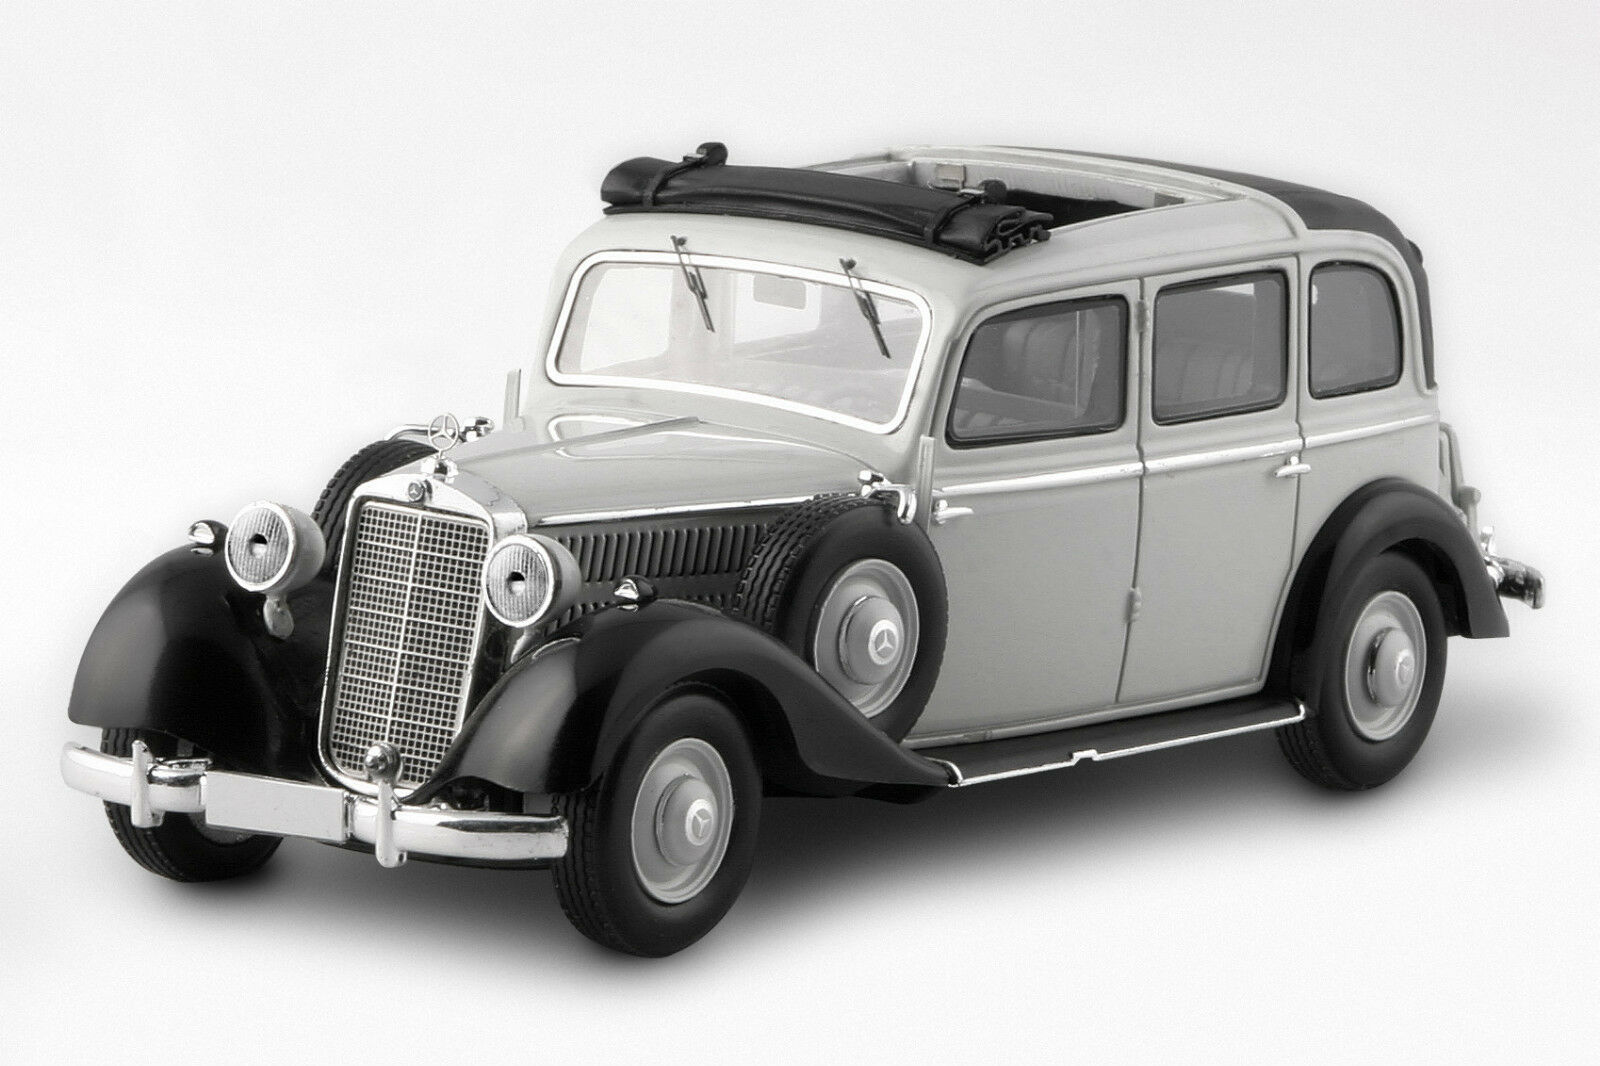 Esval Mercedes-Benz 260 D Pullman W 138 1936-1940 esval 1 43 emgemb 43001D